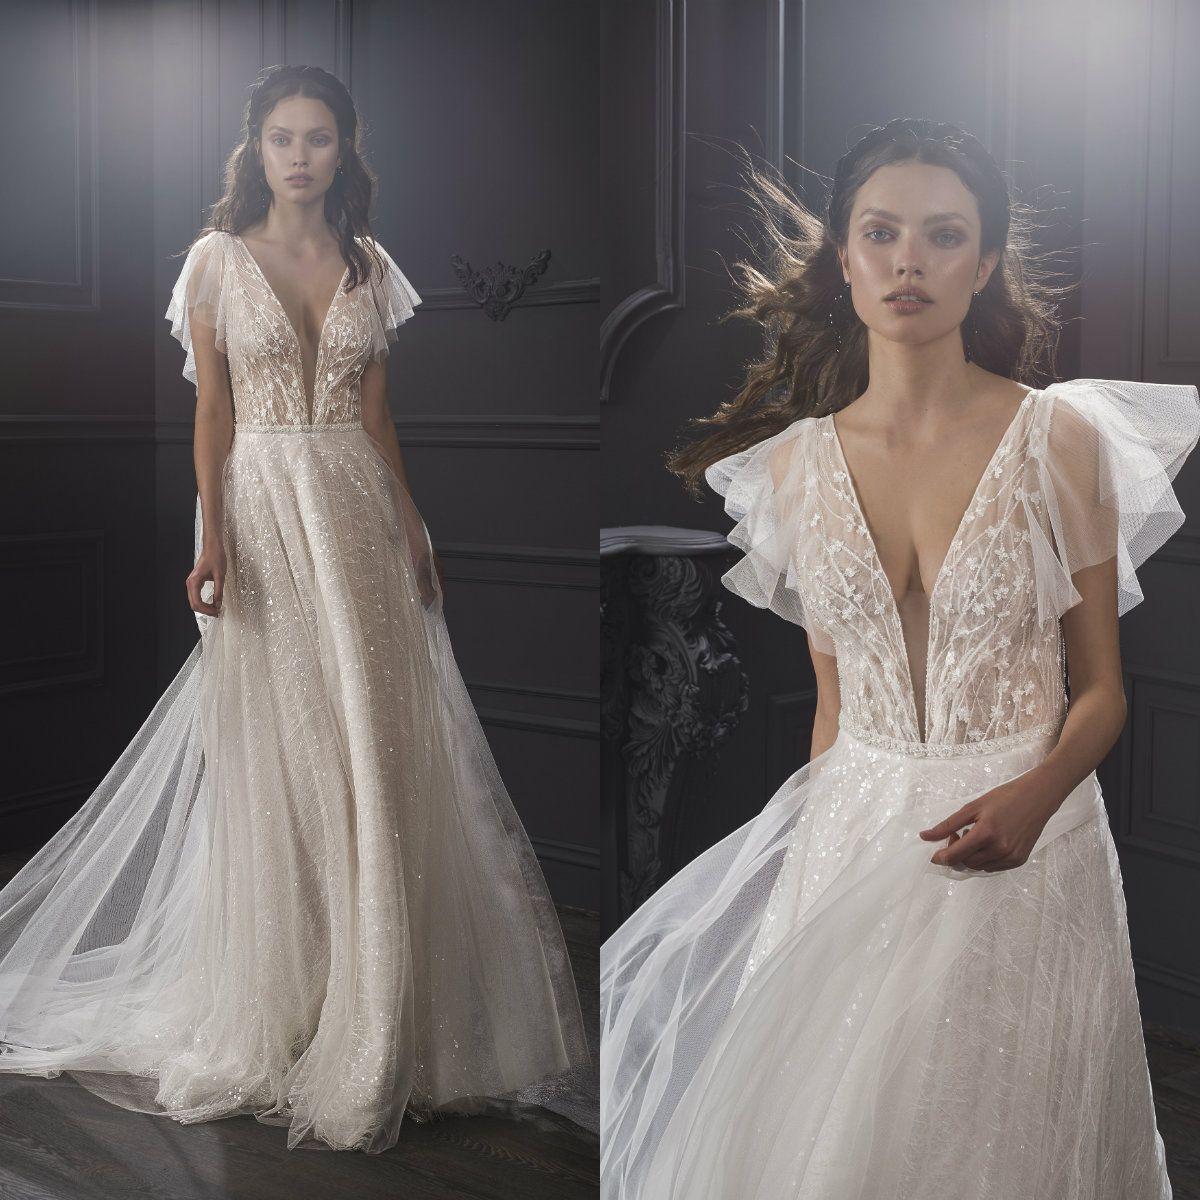 2019 Lihi Hod Boho Wedding Dresses Deep V Neck A Line Sequins Shinny Cheap Bohemian Wedding Dress Custom Made Plus Size Bridal Gowns